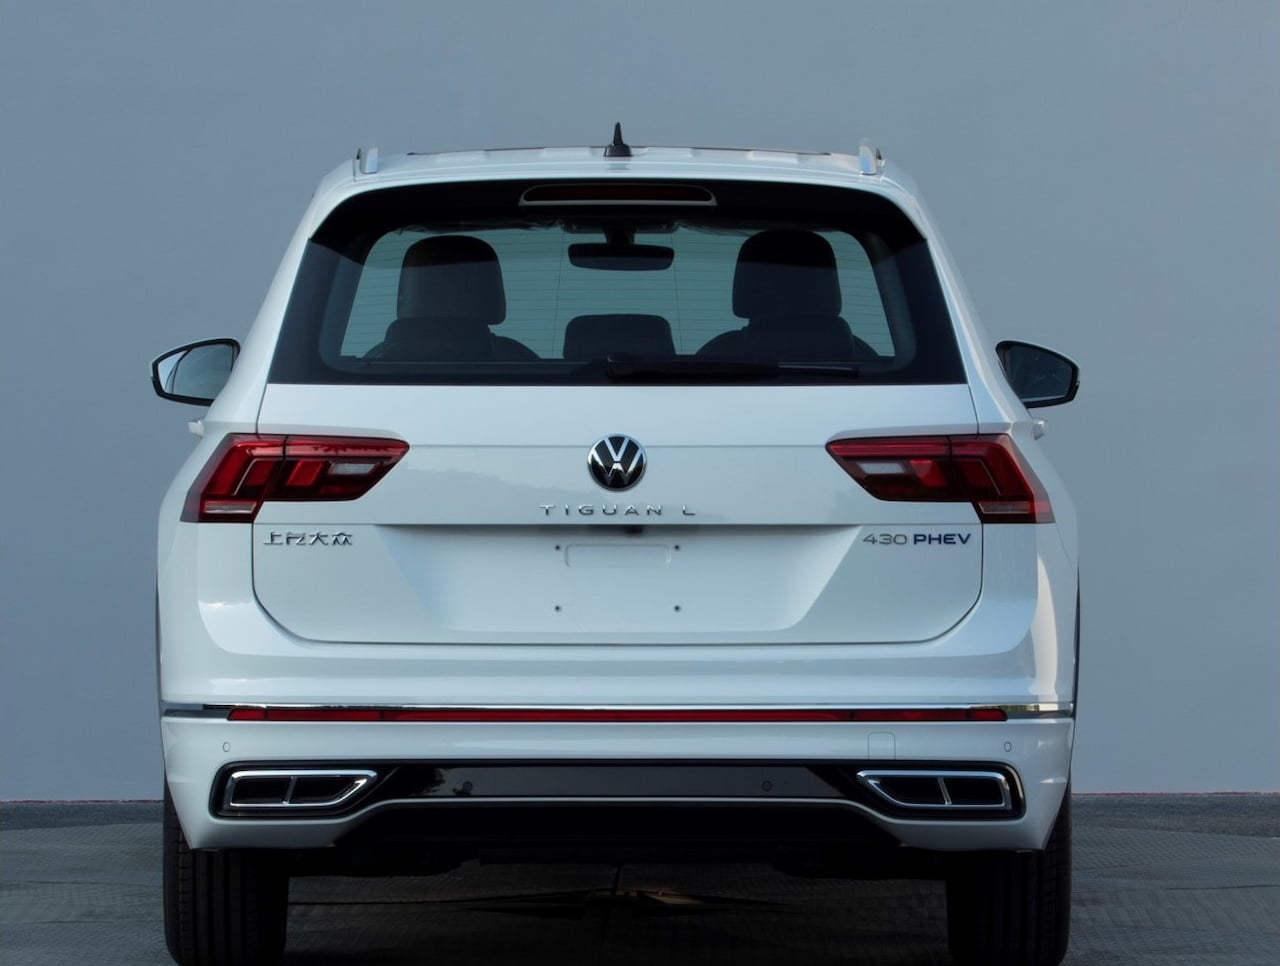 2021 VW Tiguan Allspace leaked in the plug-in hybrid variant